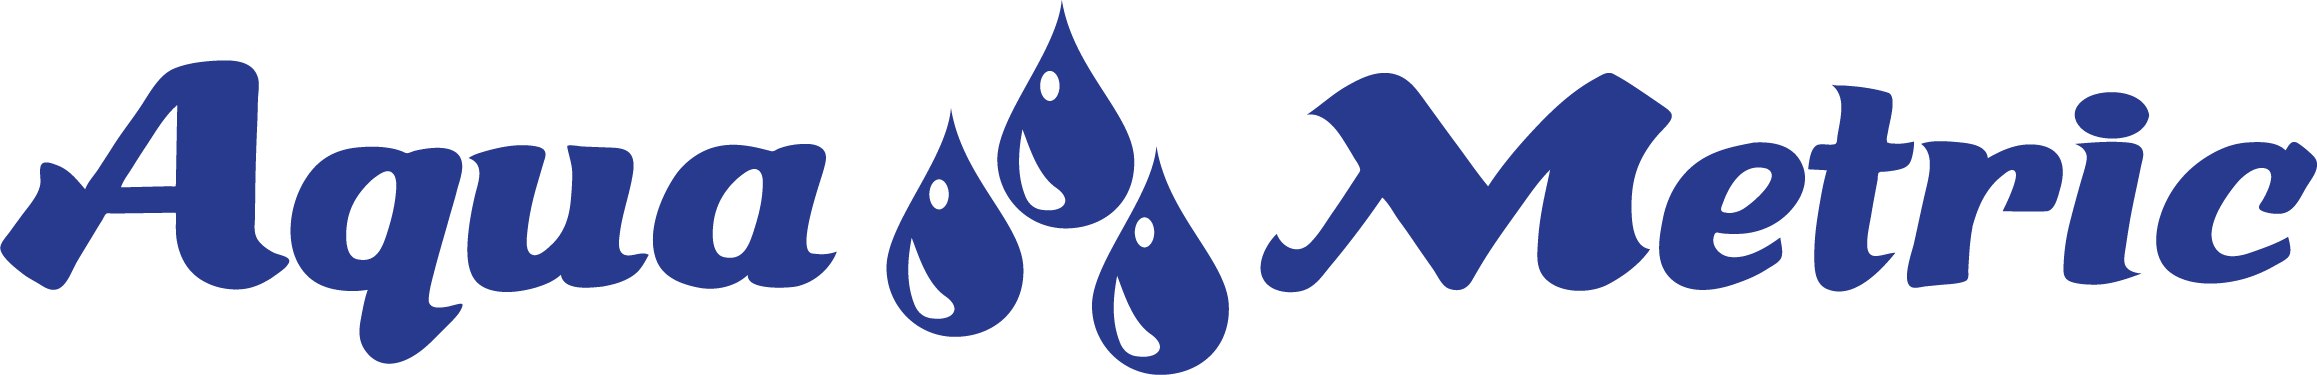 Aqua Metric